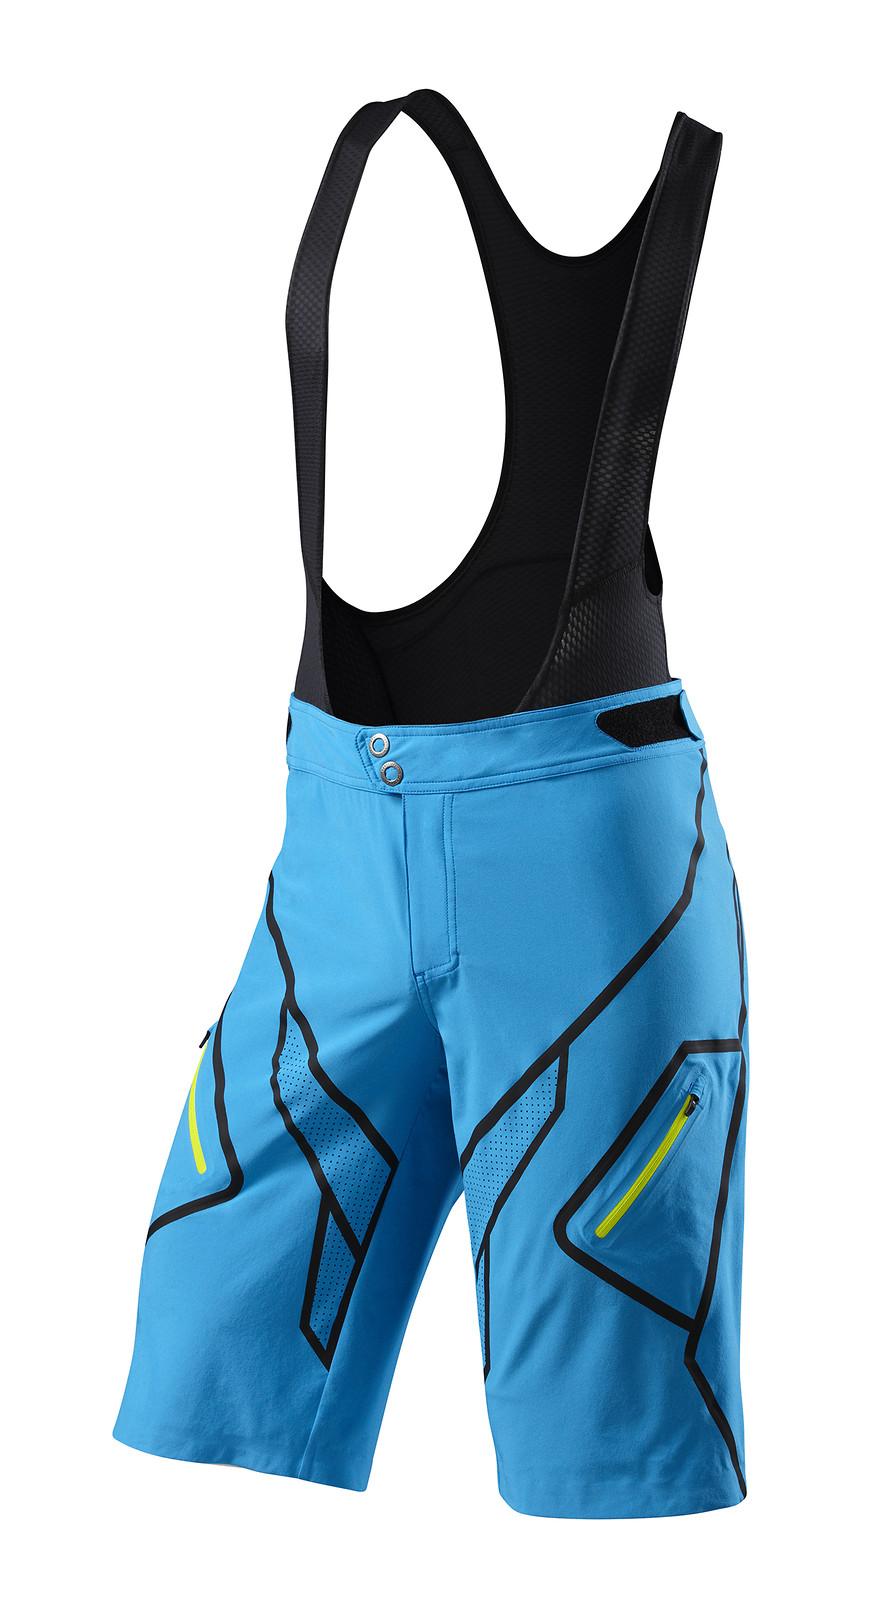 Specialized Atlas XC Pro Short - neon blue